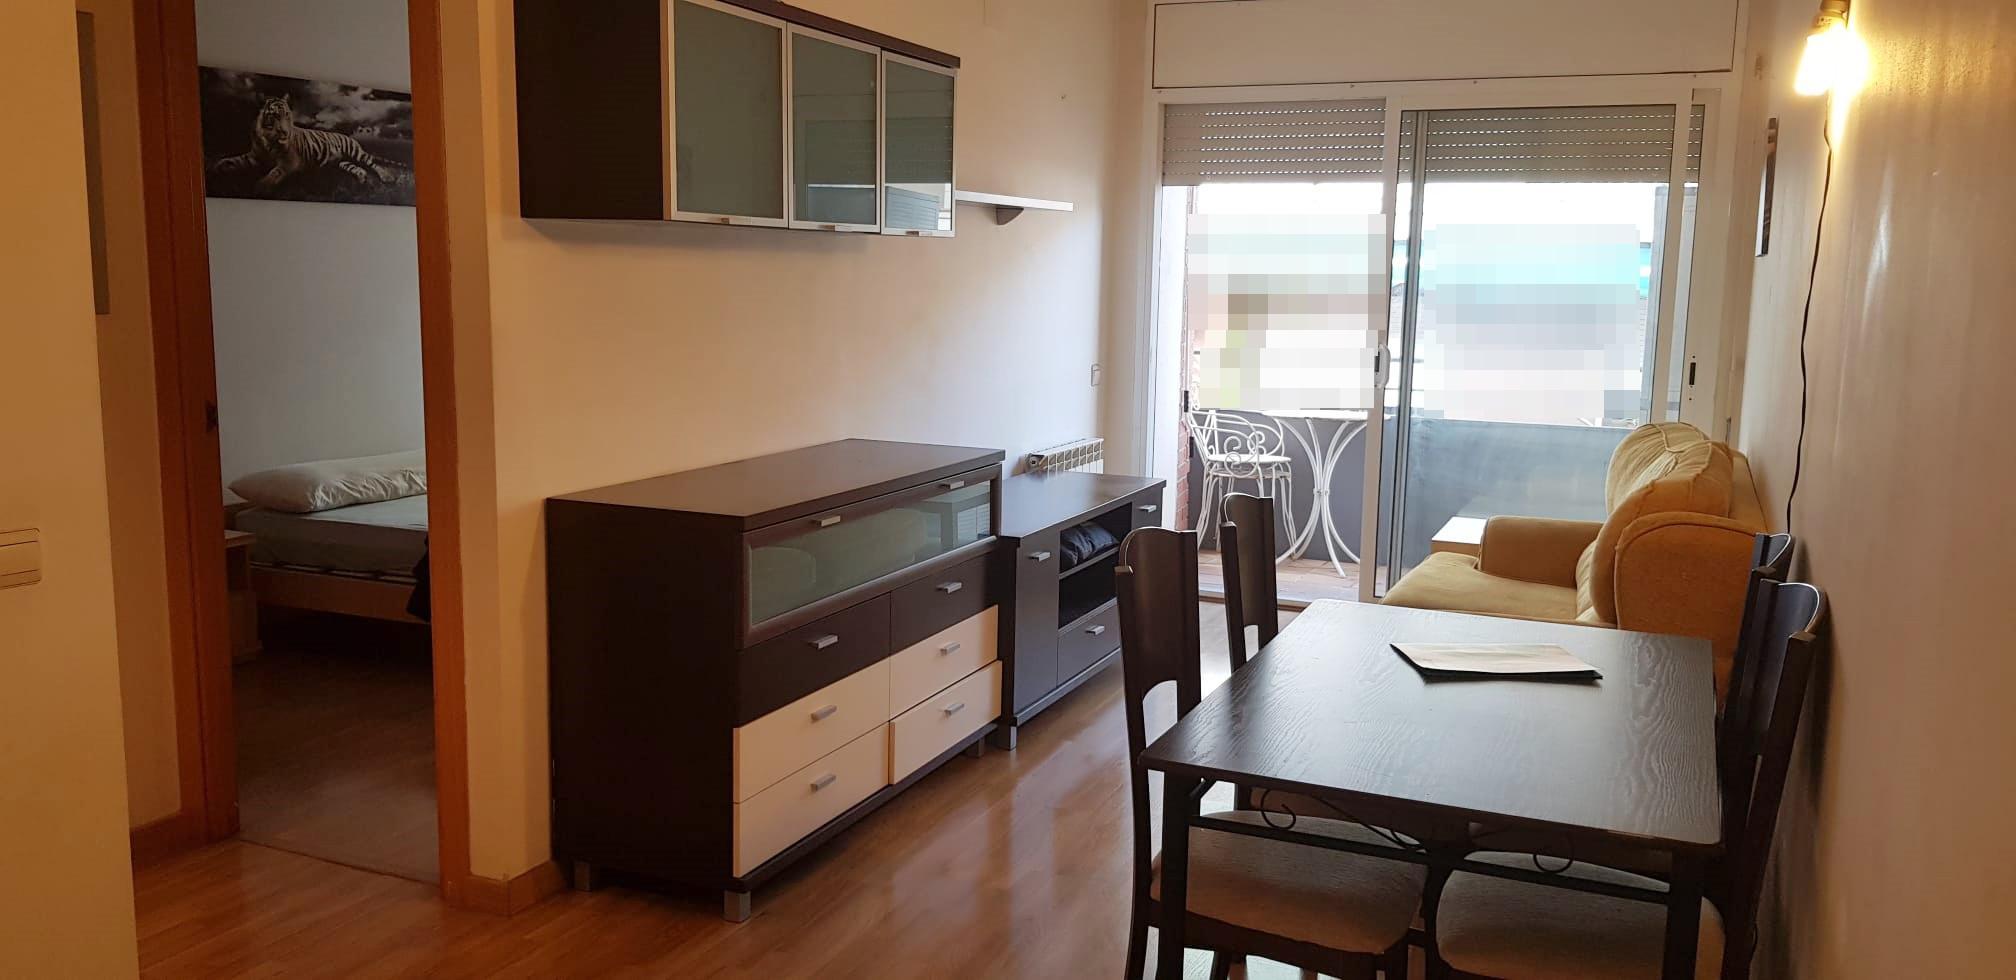 Imagen 1 Piso en venta en Canovelles / Canovelles-Pino-Guardia Urbana-cap canovelles